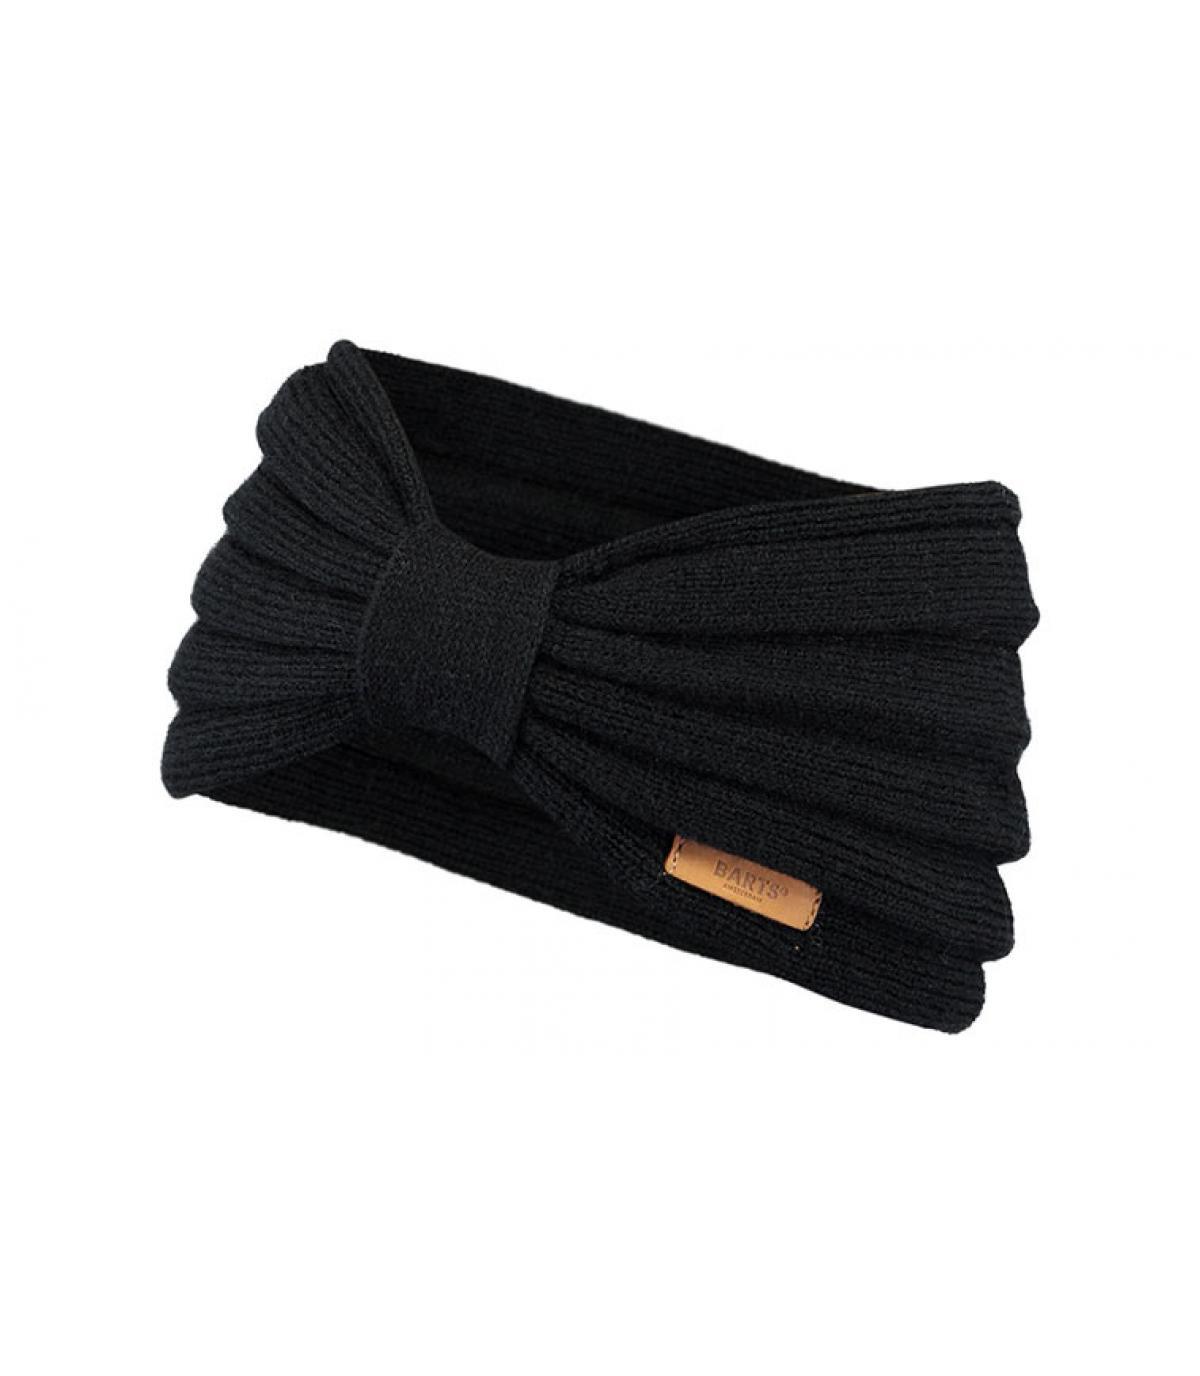 Details Zitoun Headband black - afbeeling 2